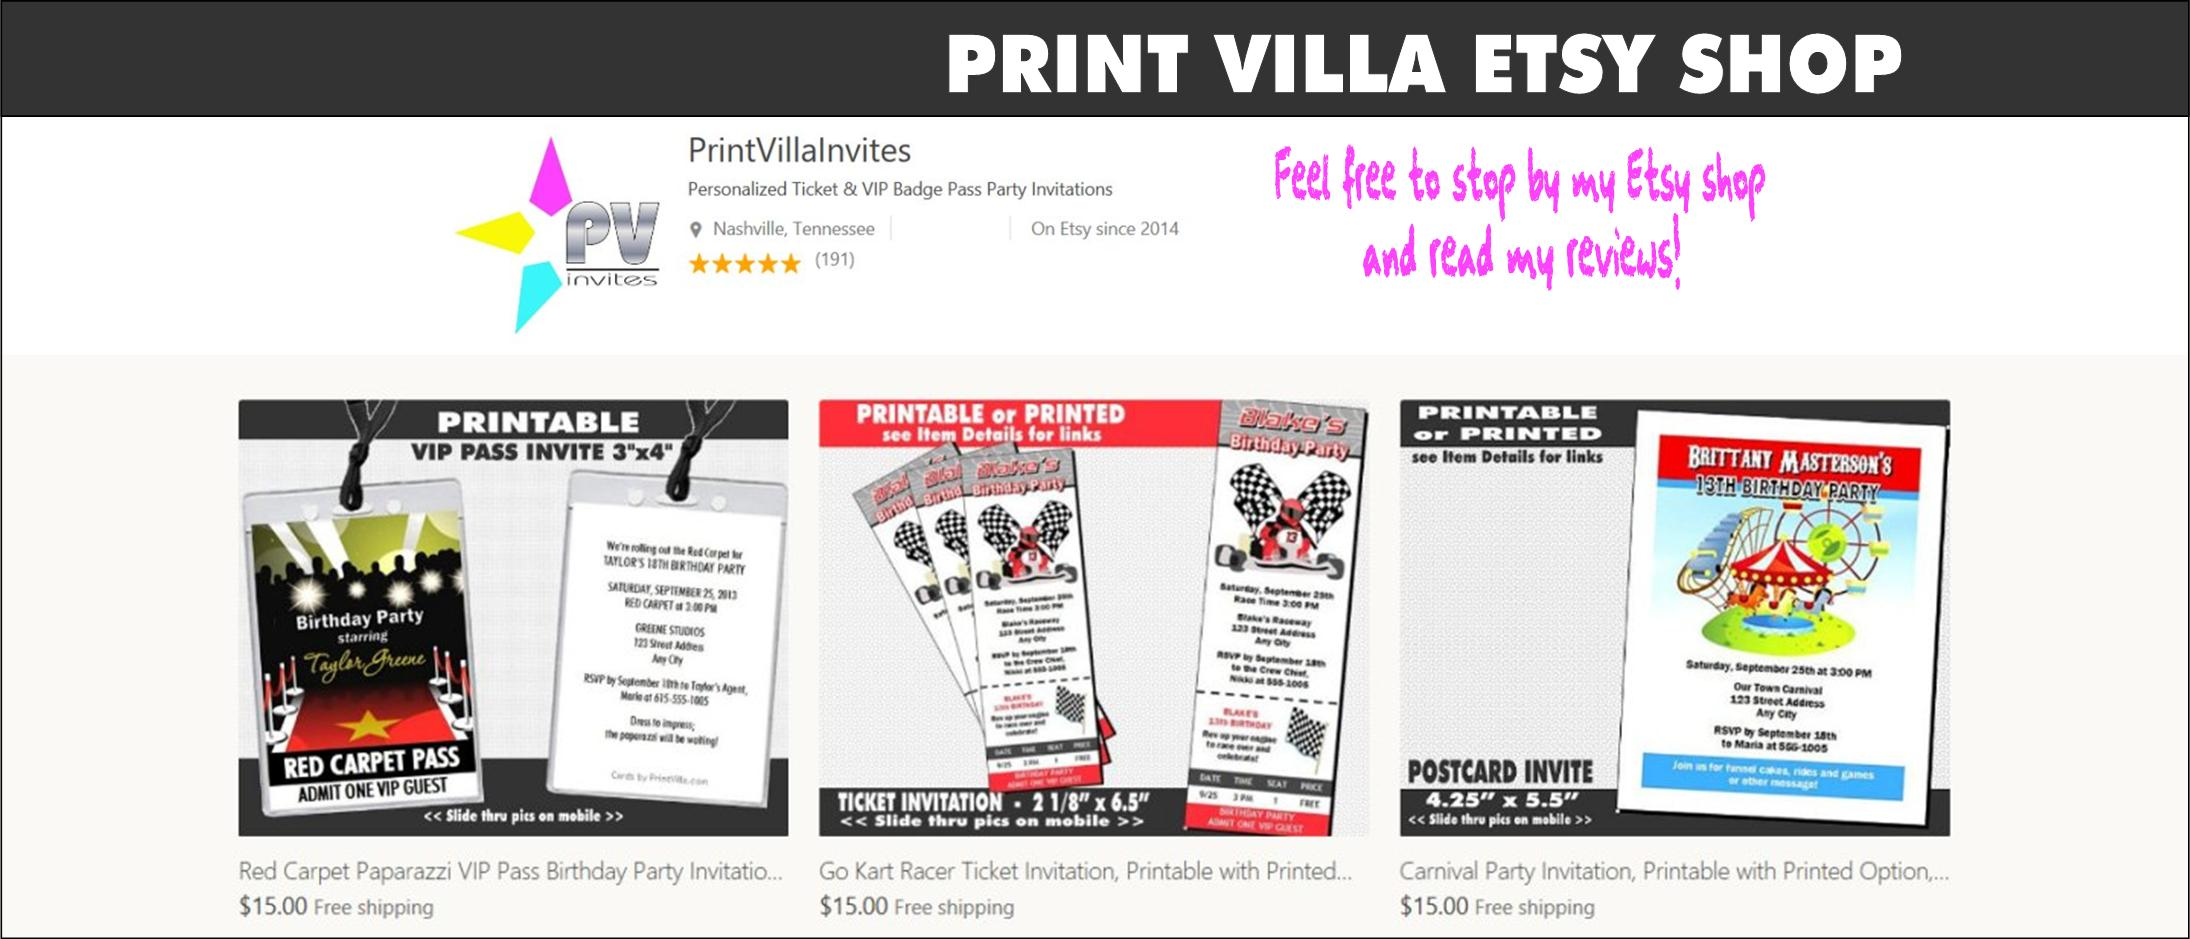 Print Villa Etsy Shop